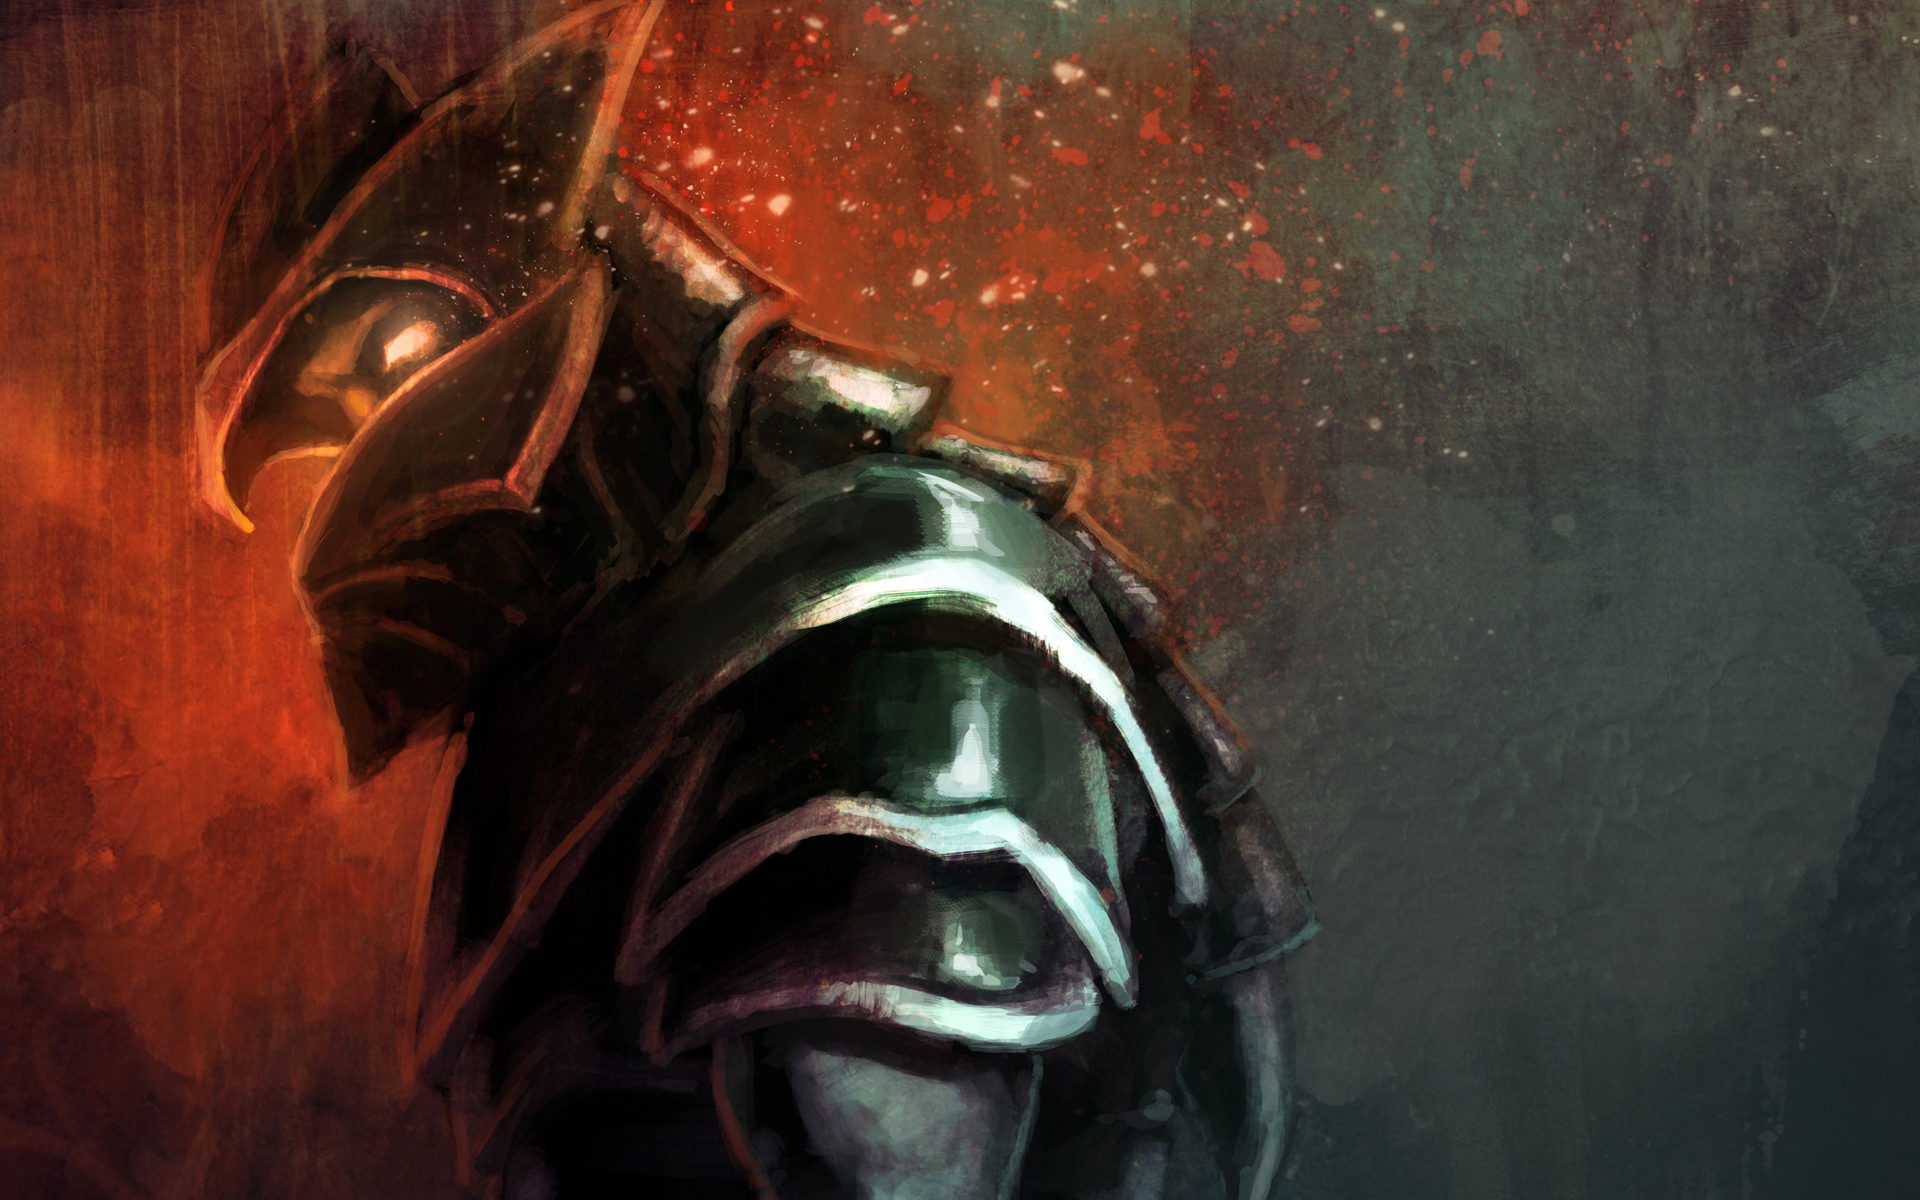 Dragon knight build guide dota 2 wyrmblade cuts deep items voltagebd Gallery